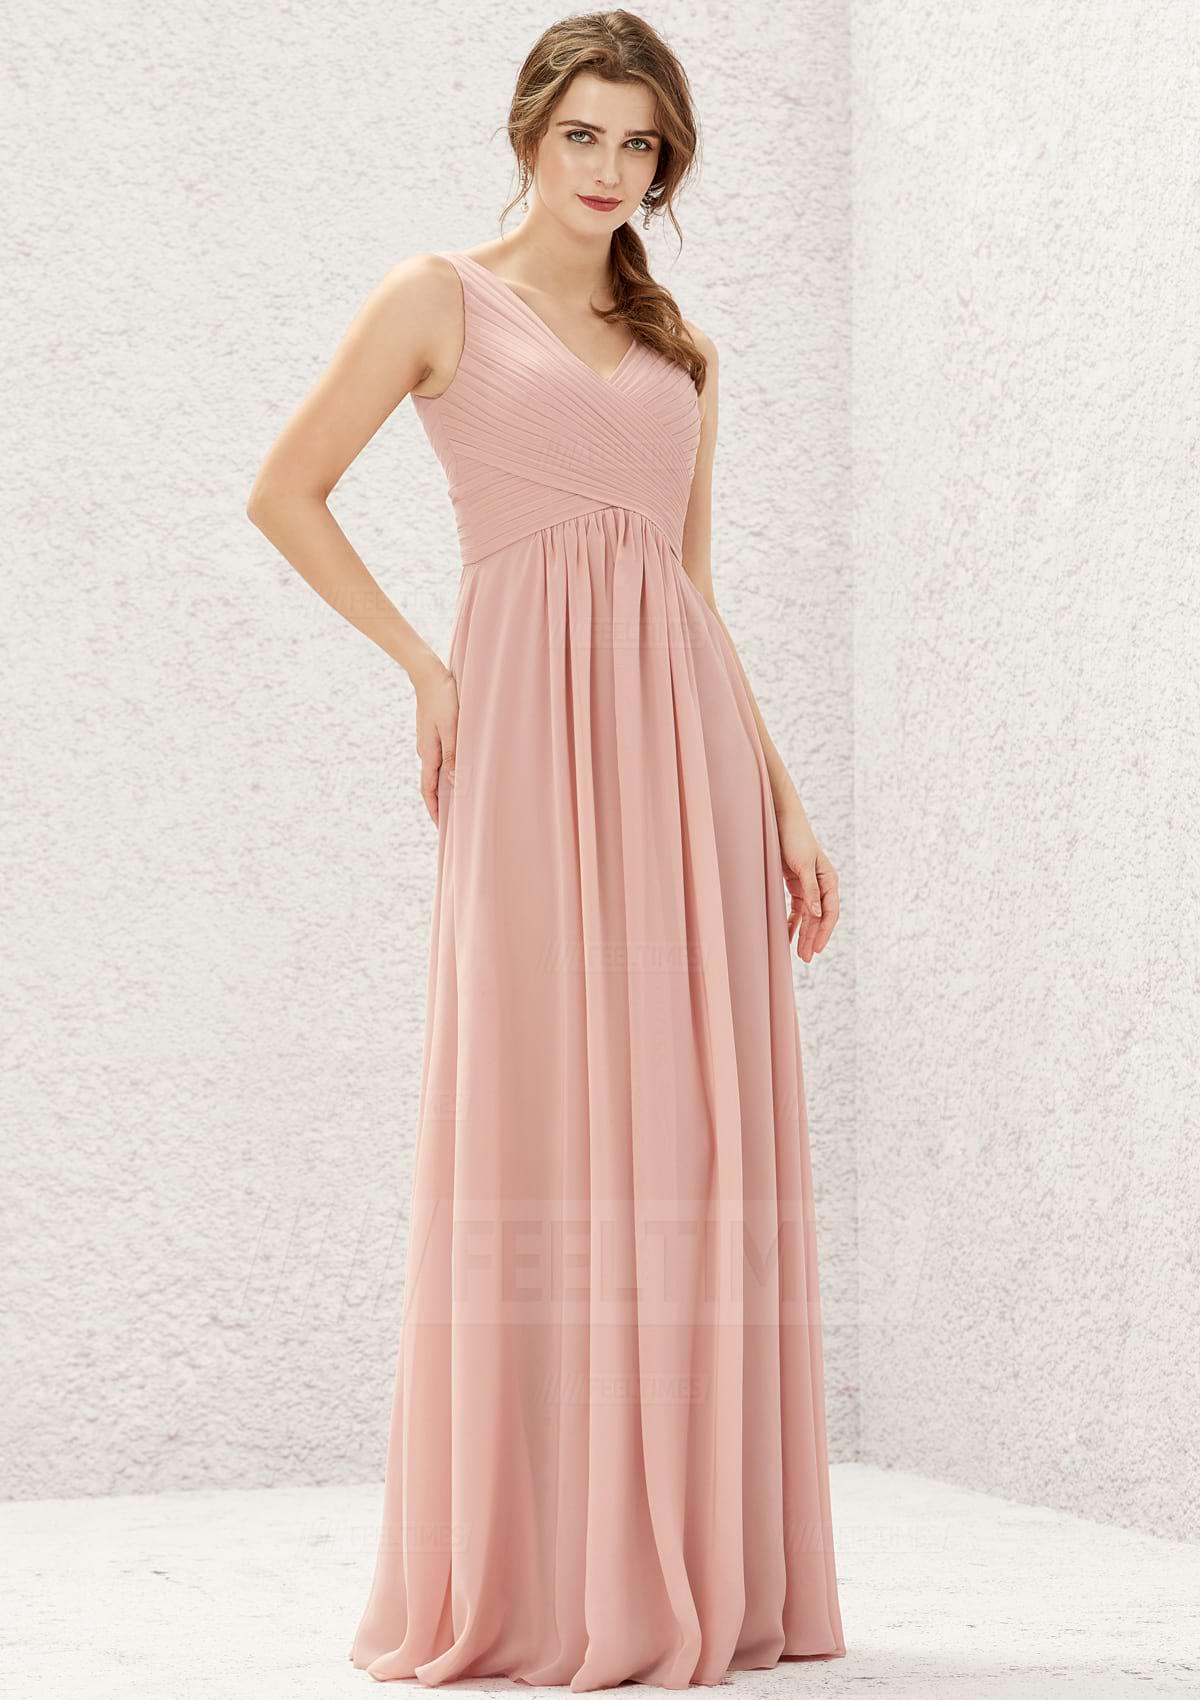 A-line/Princess Sleeveless Long/Floor-Length Chiffon Bridesmaid Dress With Pleated